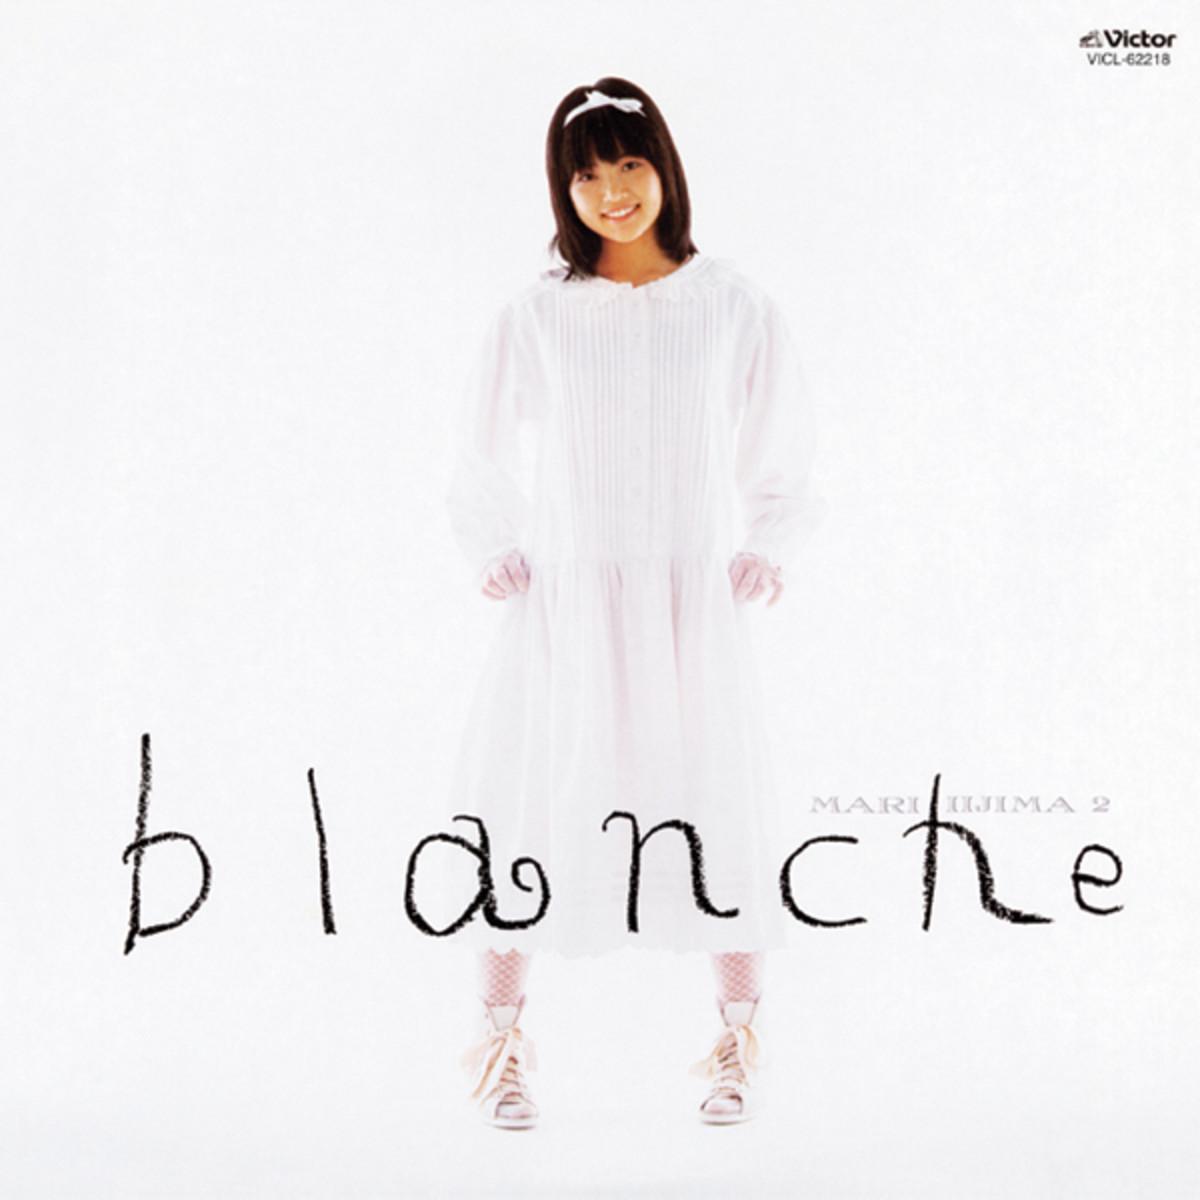 20170415.0846.18 Mari Iijima - Blanche (1984) (FLAC) cover.jpg